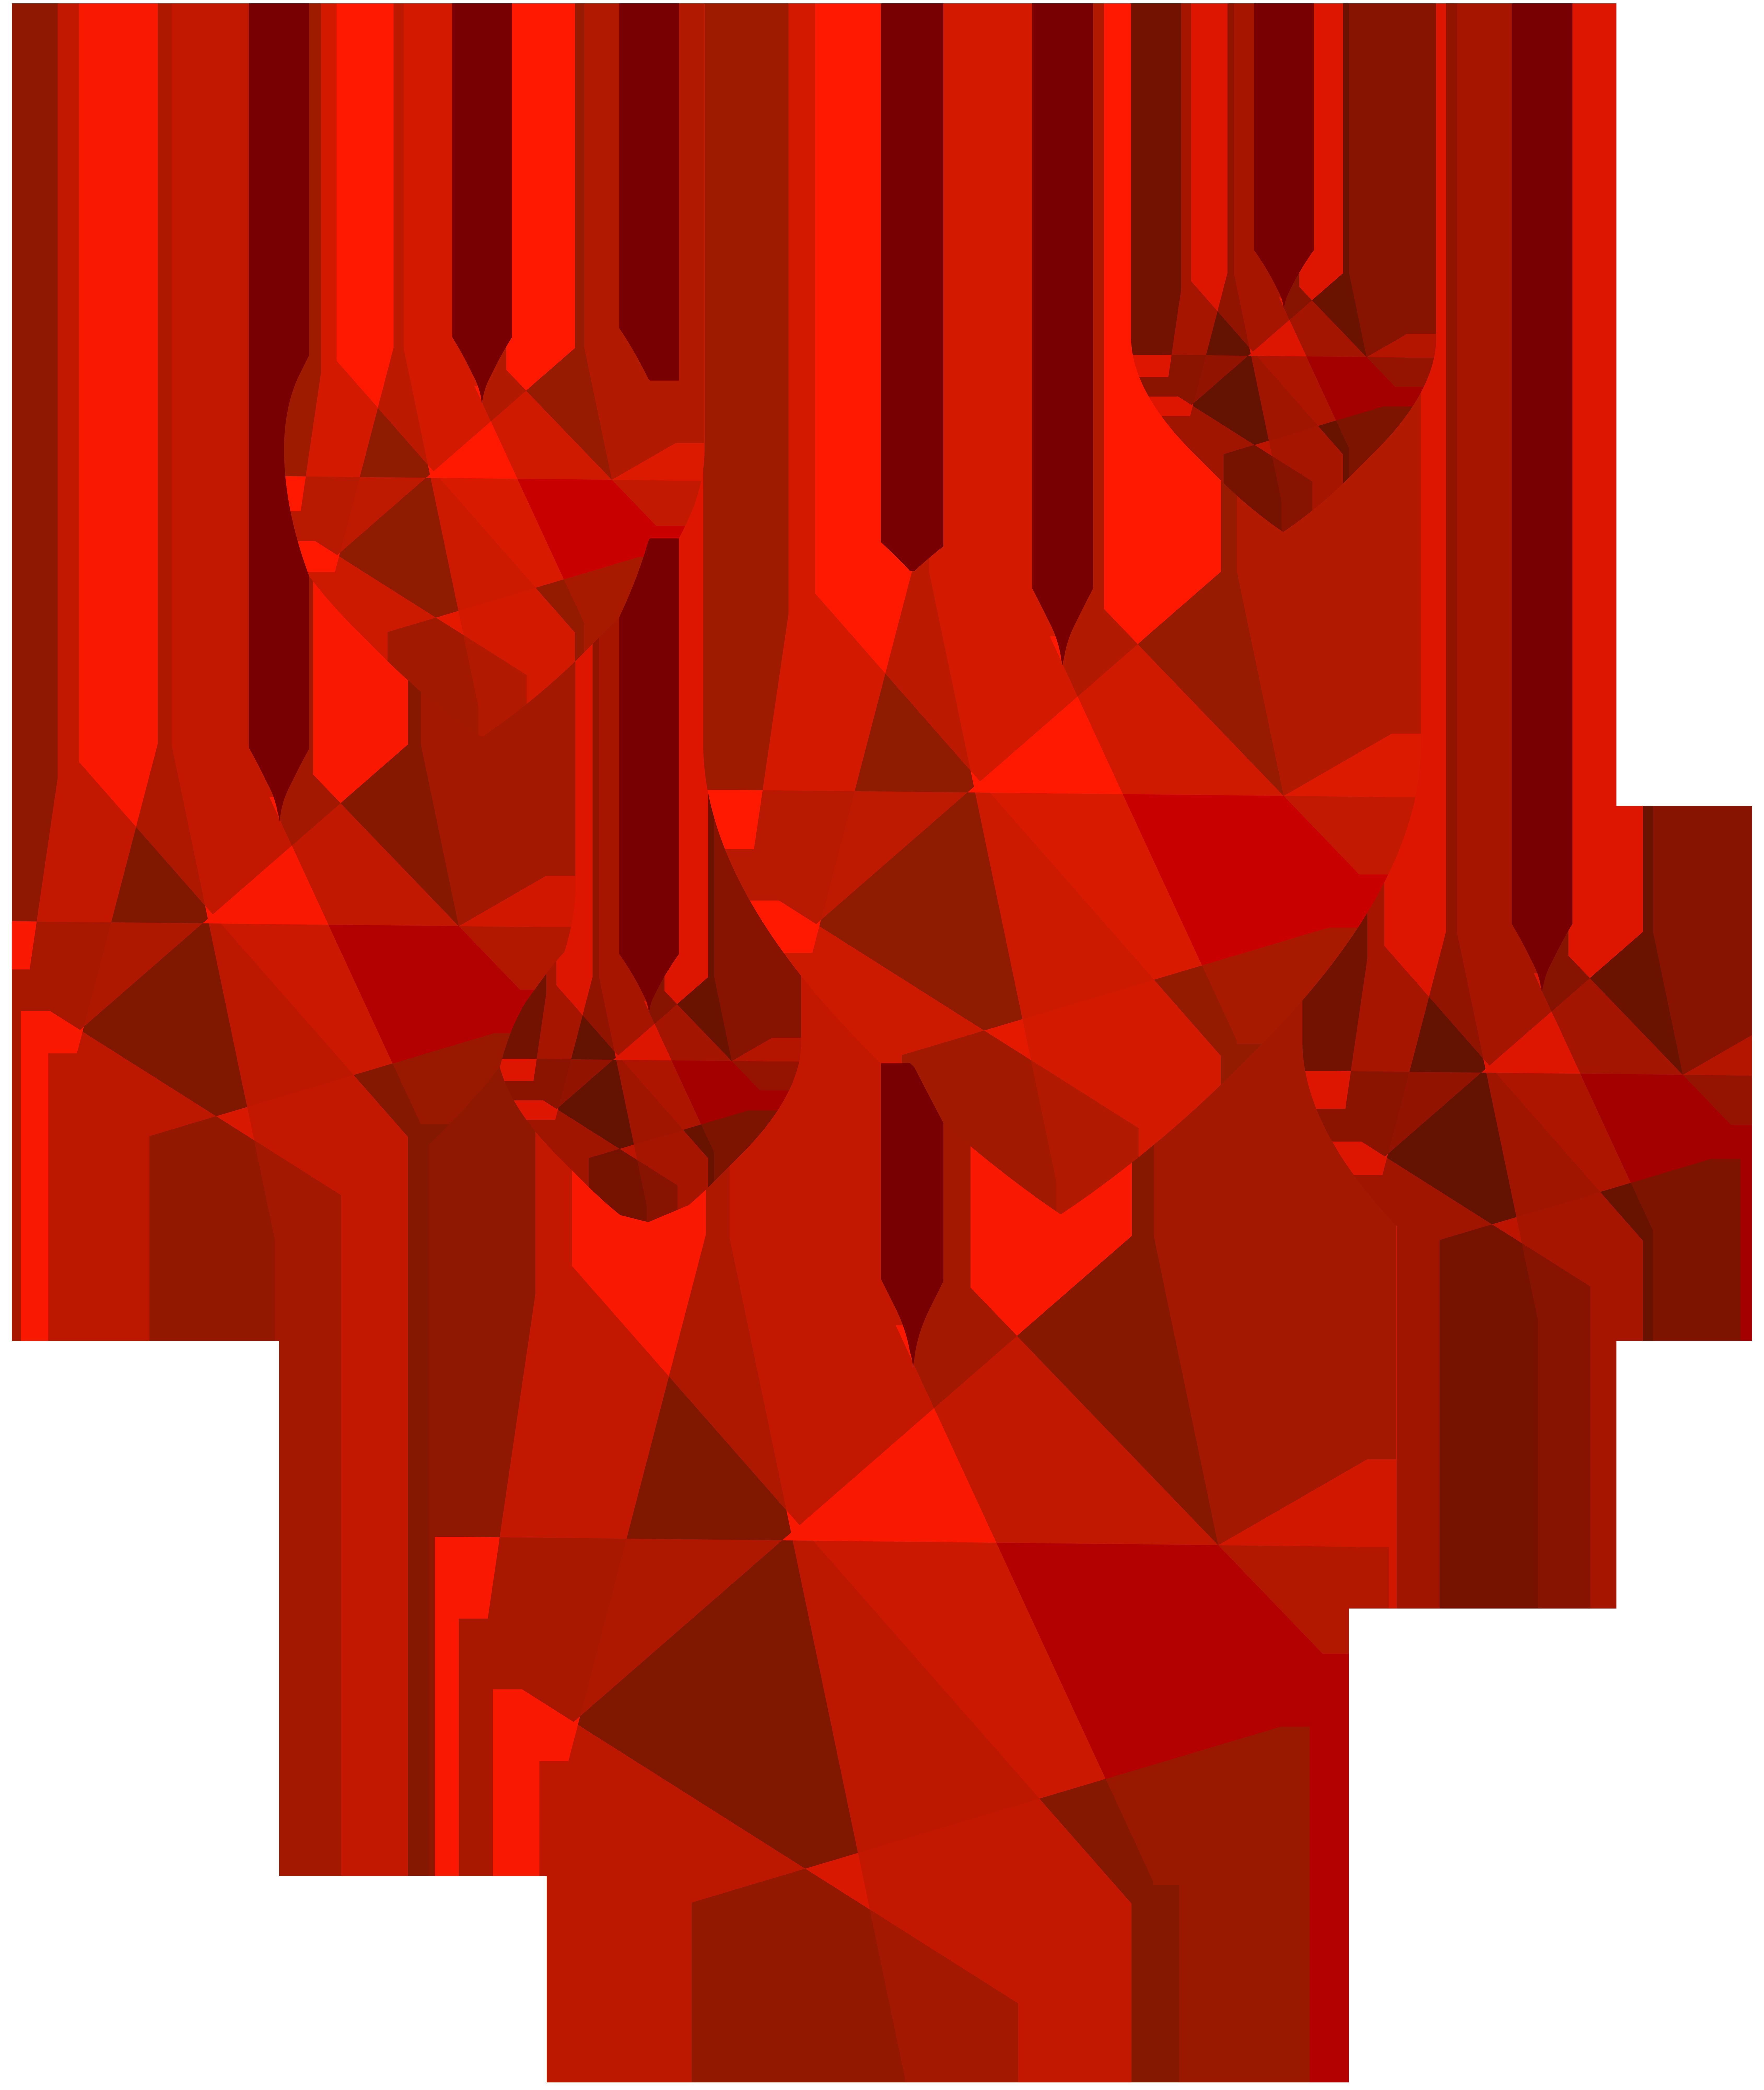 Rock clipart heart. Hanging hearts transparent clip